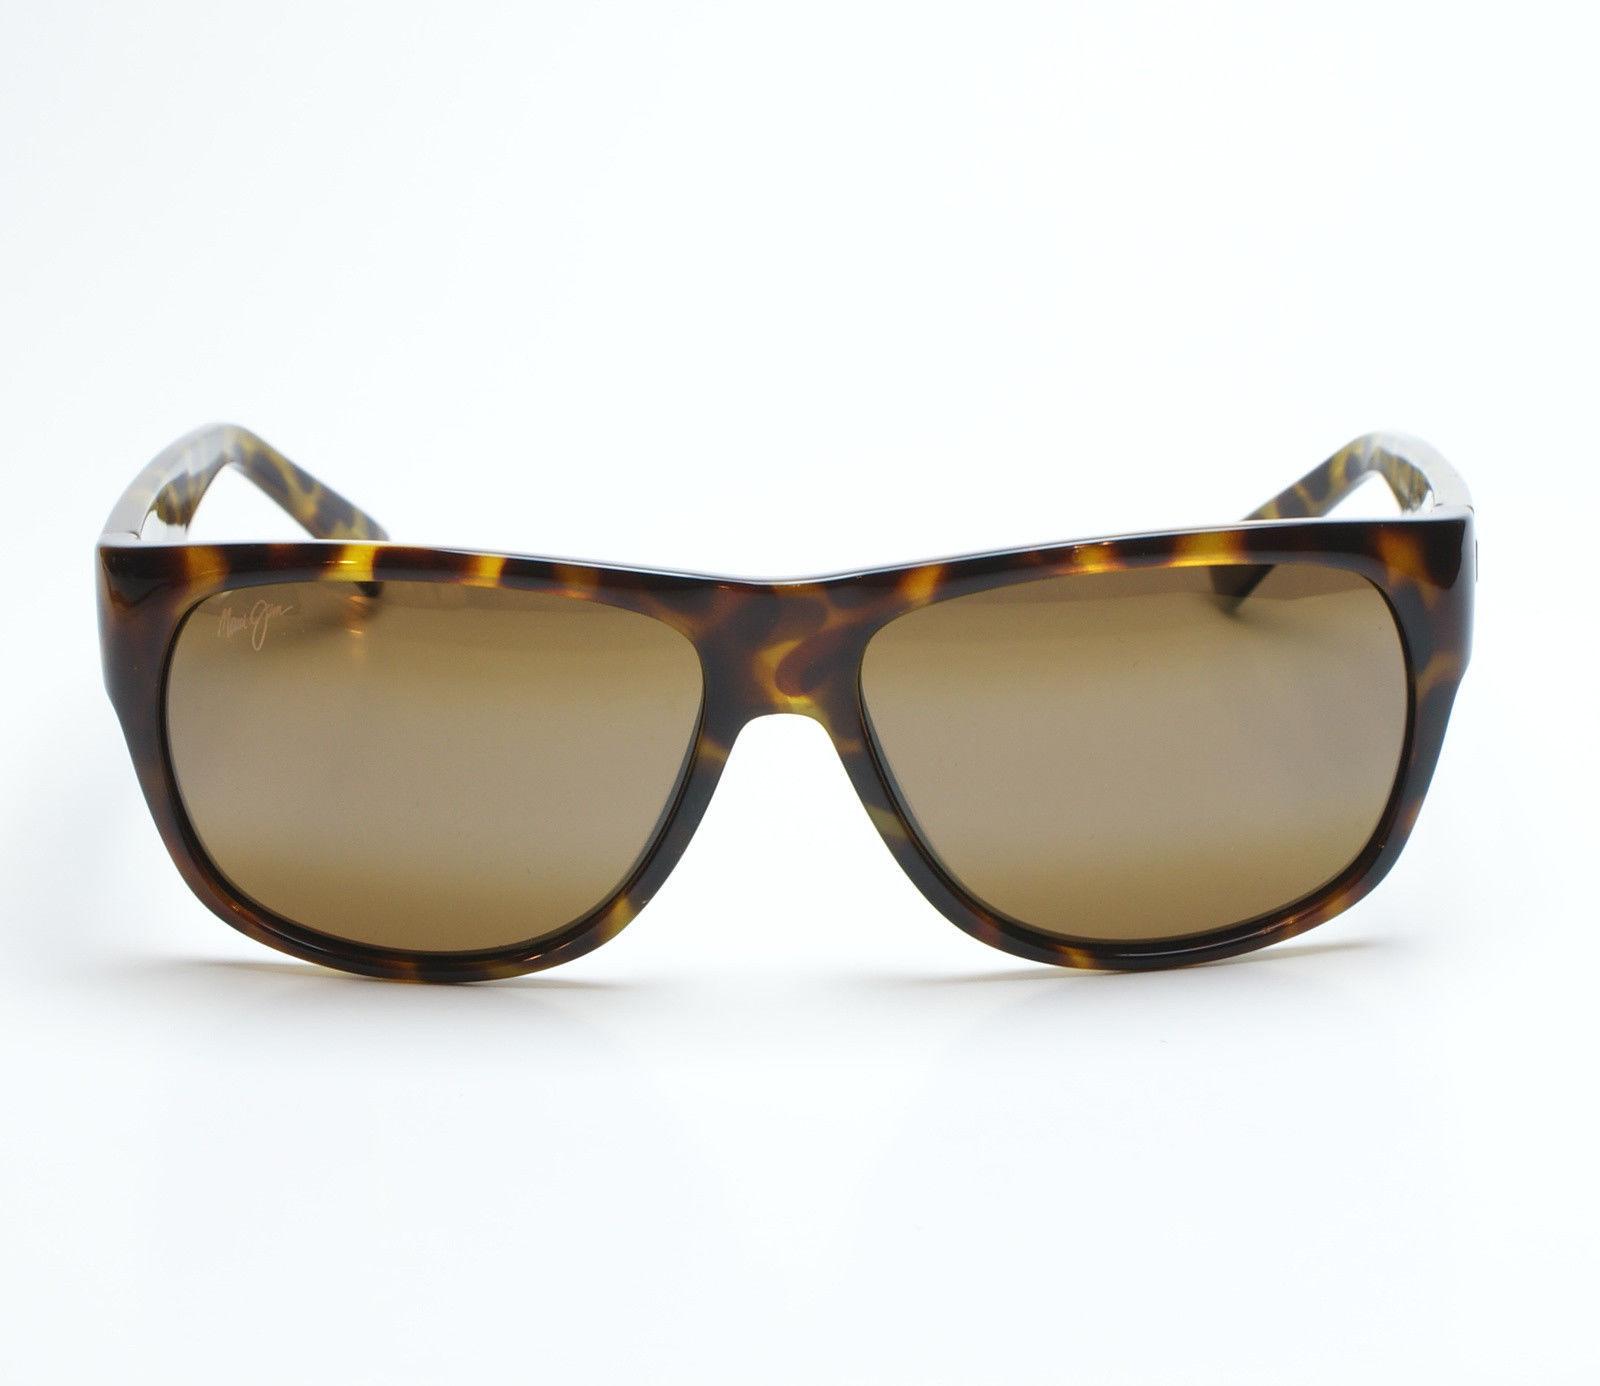 Maui Jim Makawao H282-10L Polarized Sunglasses - Light Tortoise/HCL Bronze